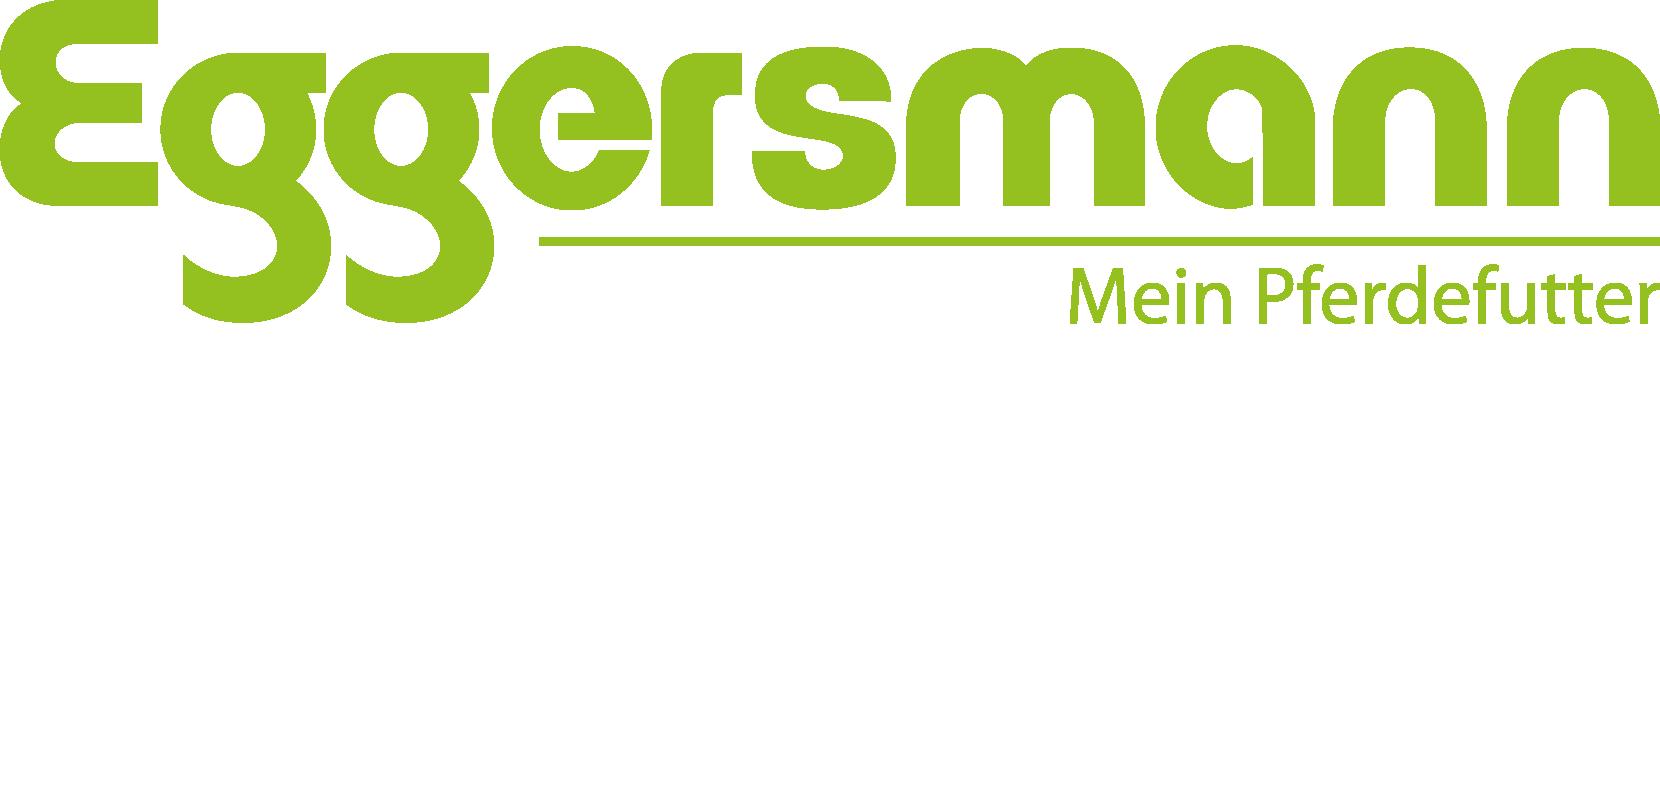 Eggersmann - Mein Pferdefutter